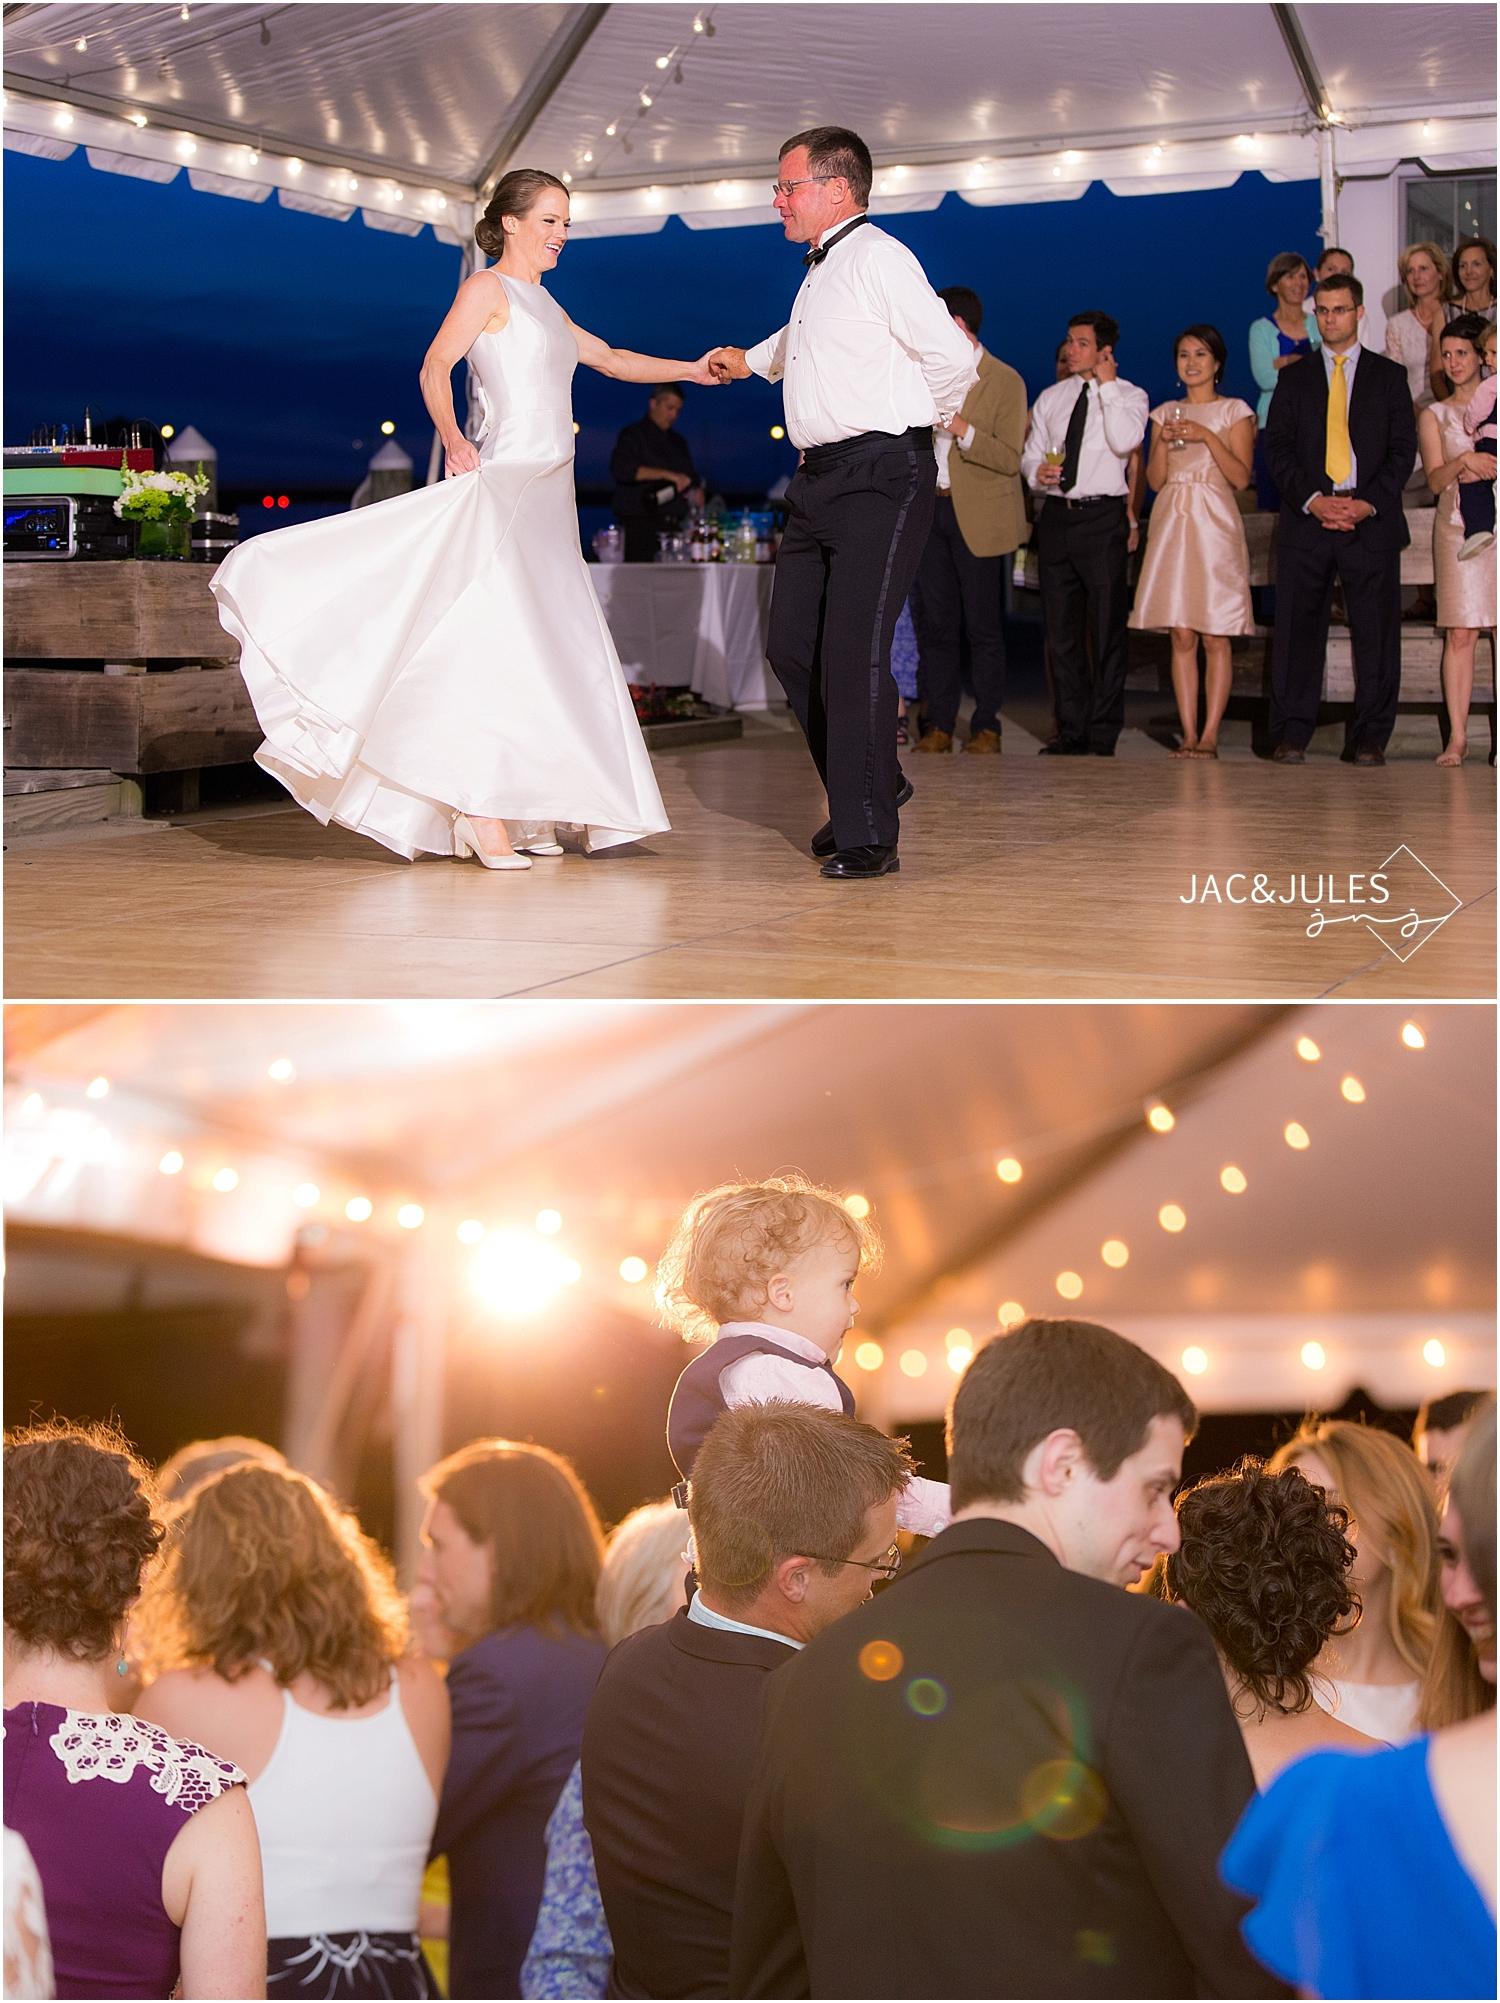 jacnjules photograph wedding reception at mantoloking yacht club in nj